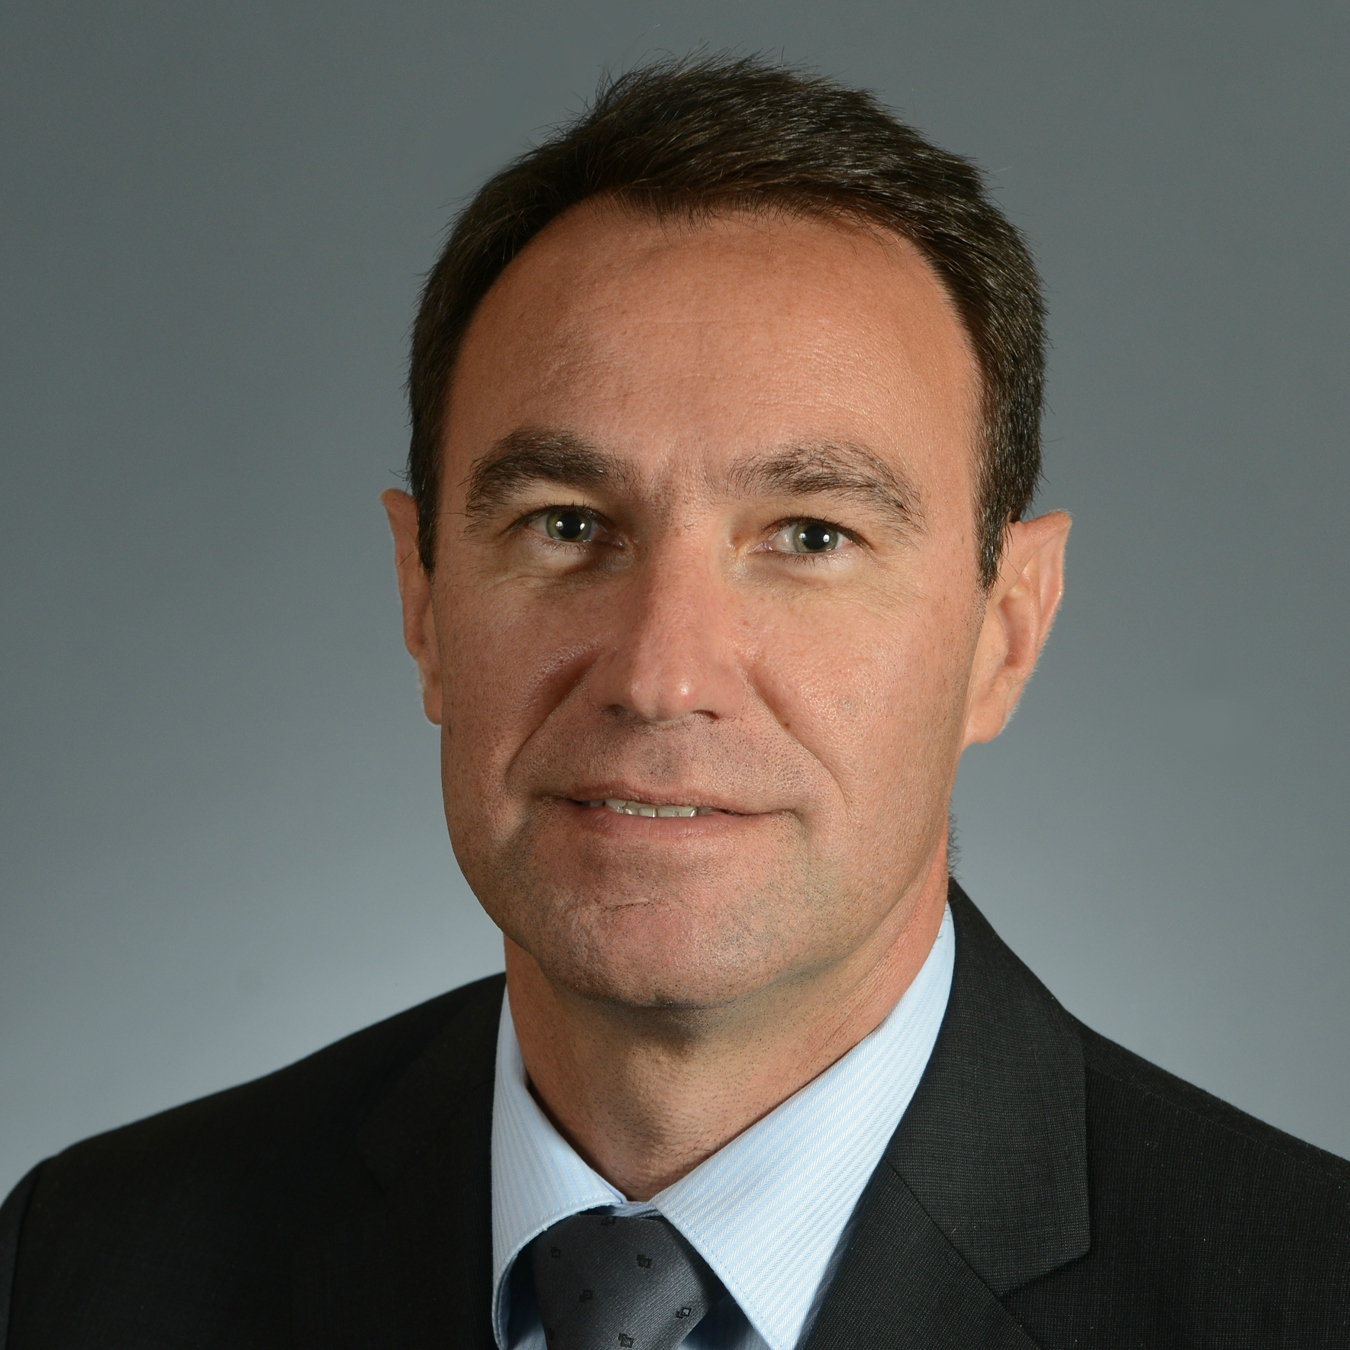 MARCIO ANTONIO ROCHA